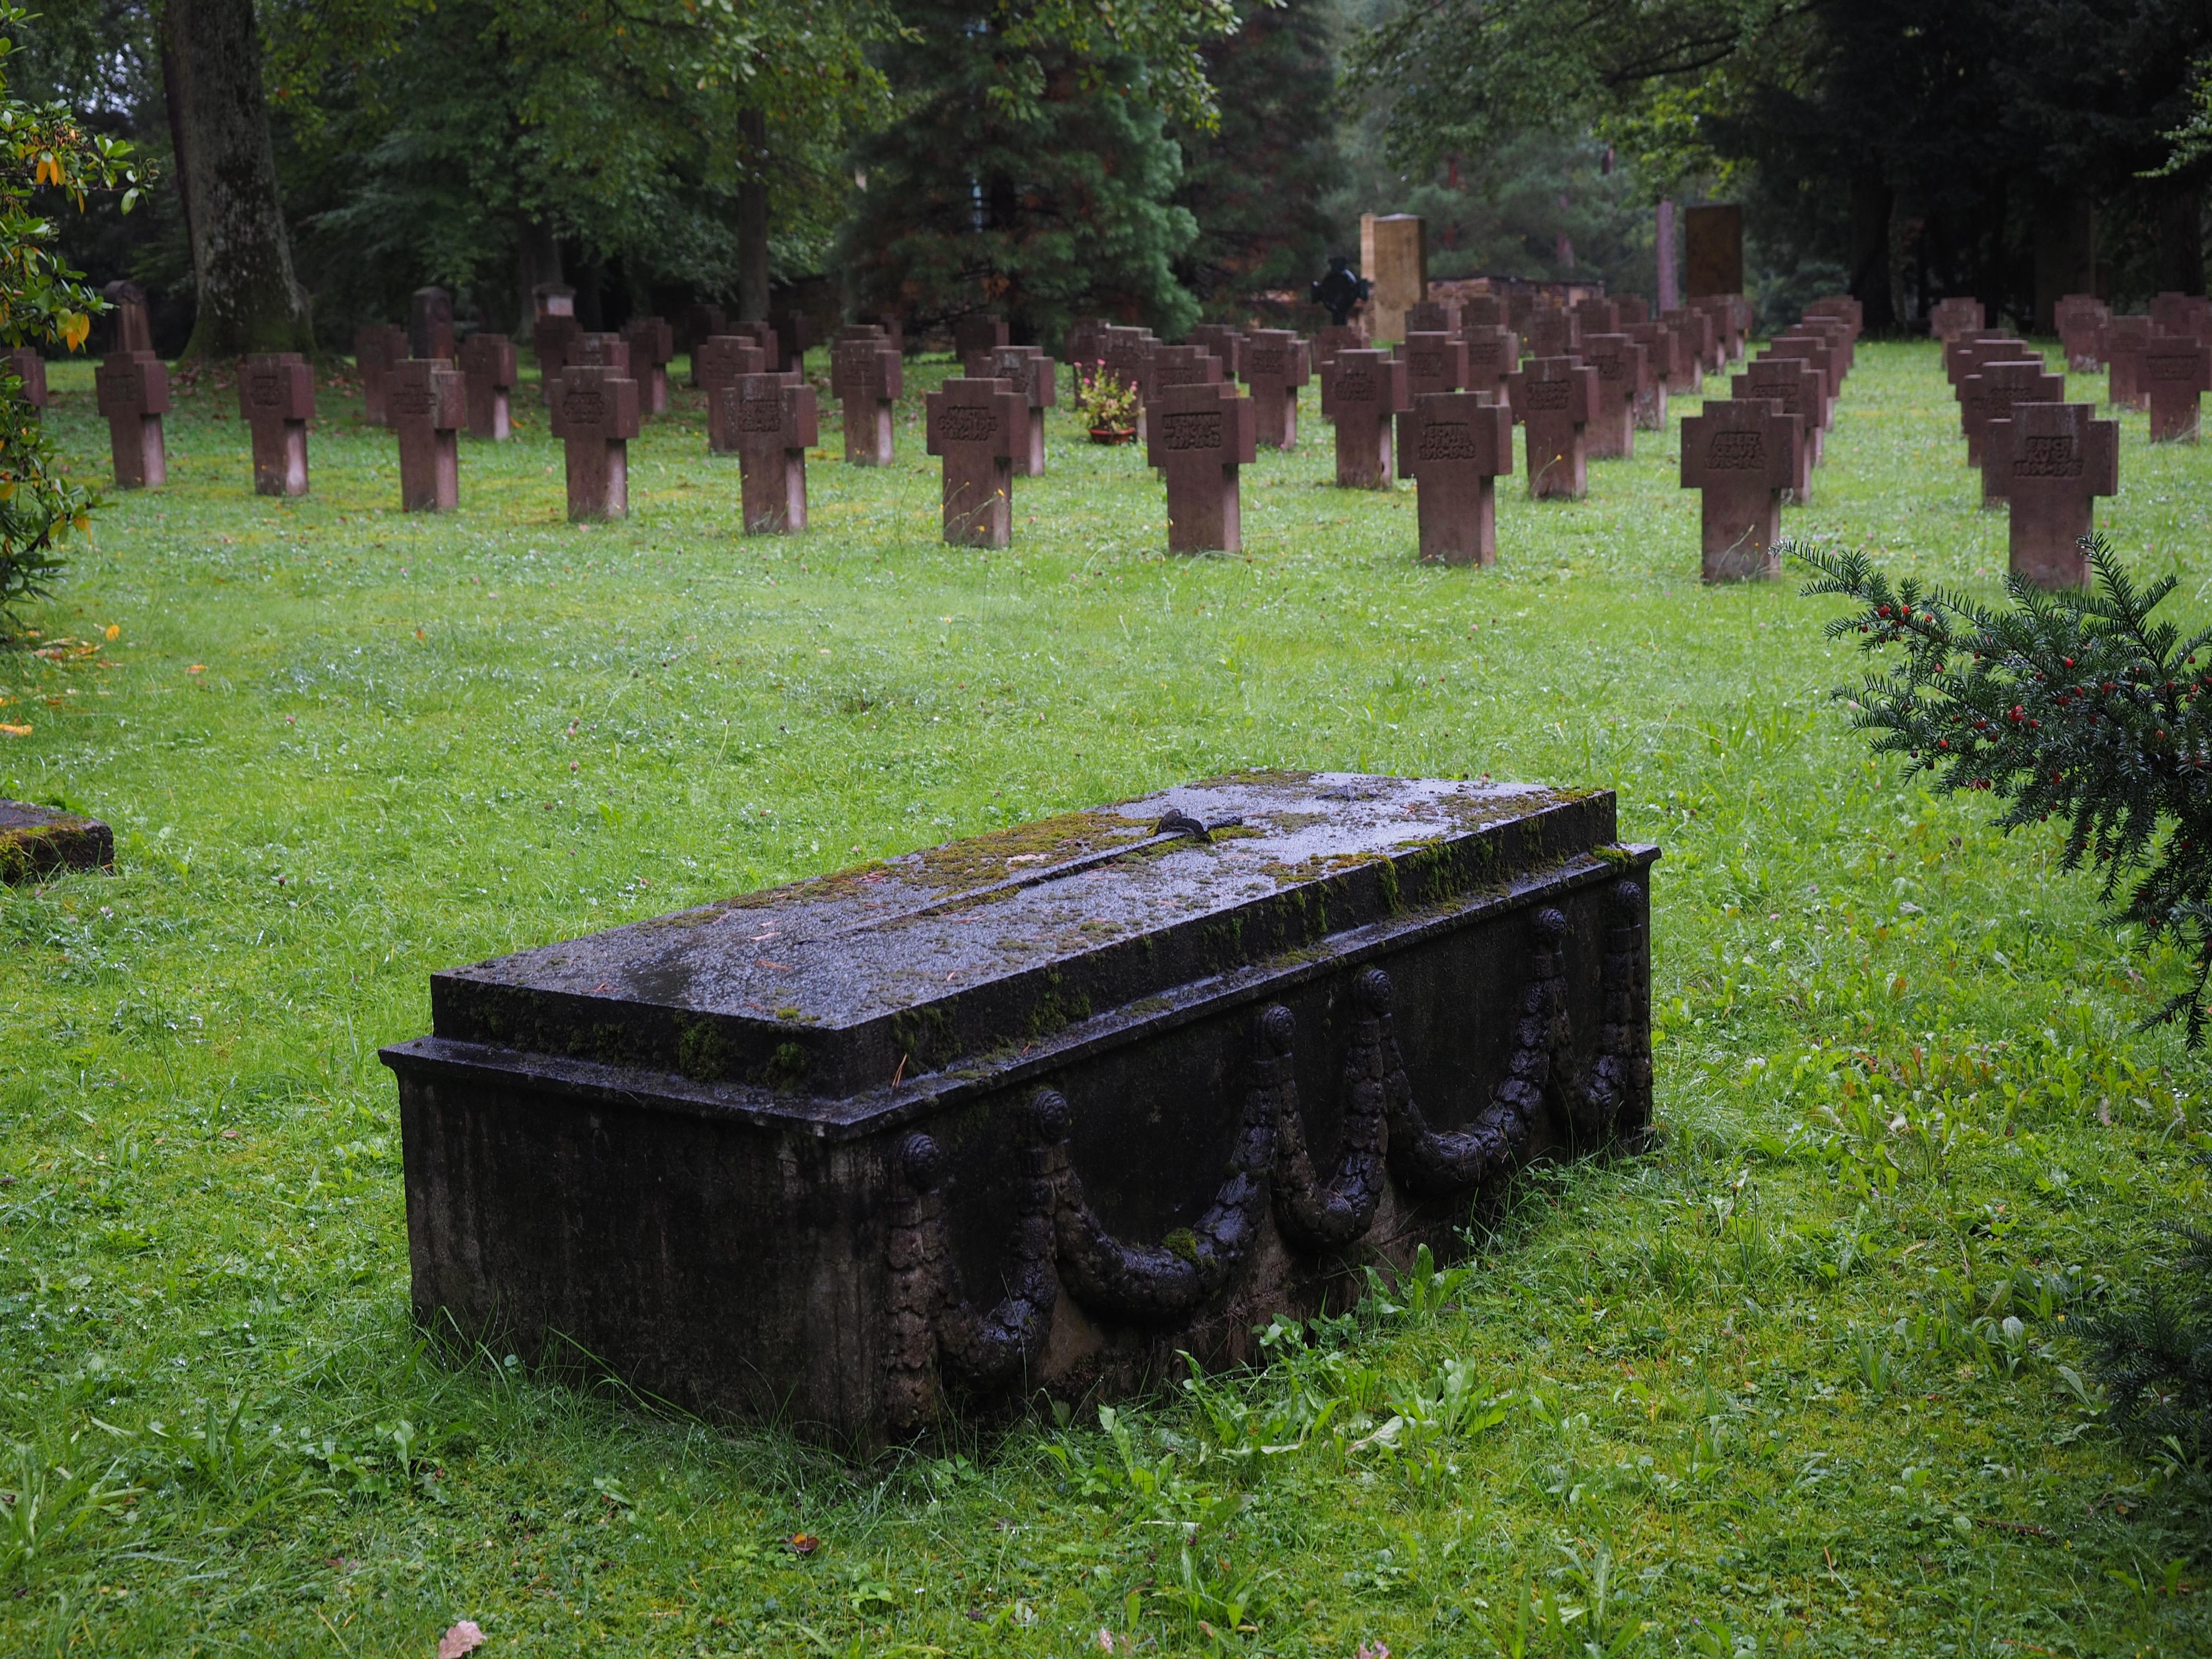 Fotos Gratis 225 Rbol Oscuro Cementerio Jard 237 N Tumba